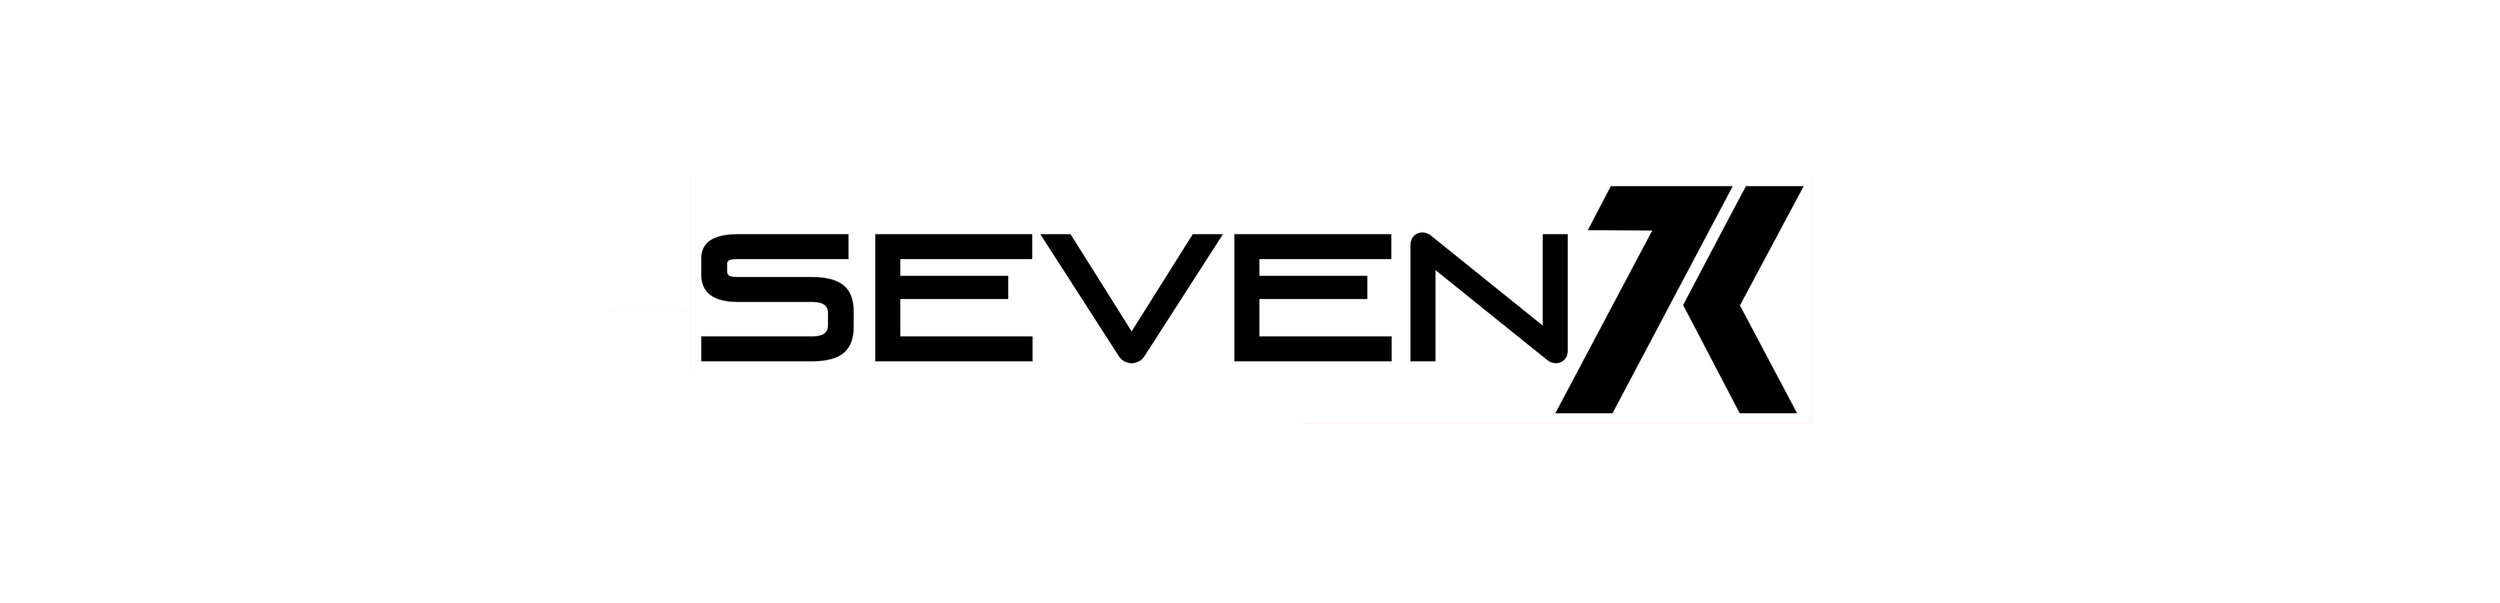 SEVEN K sticker qqqand black.jpg